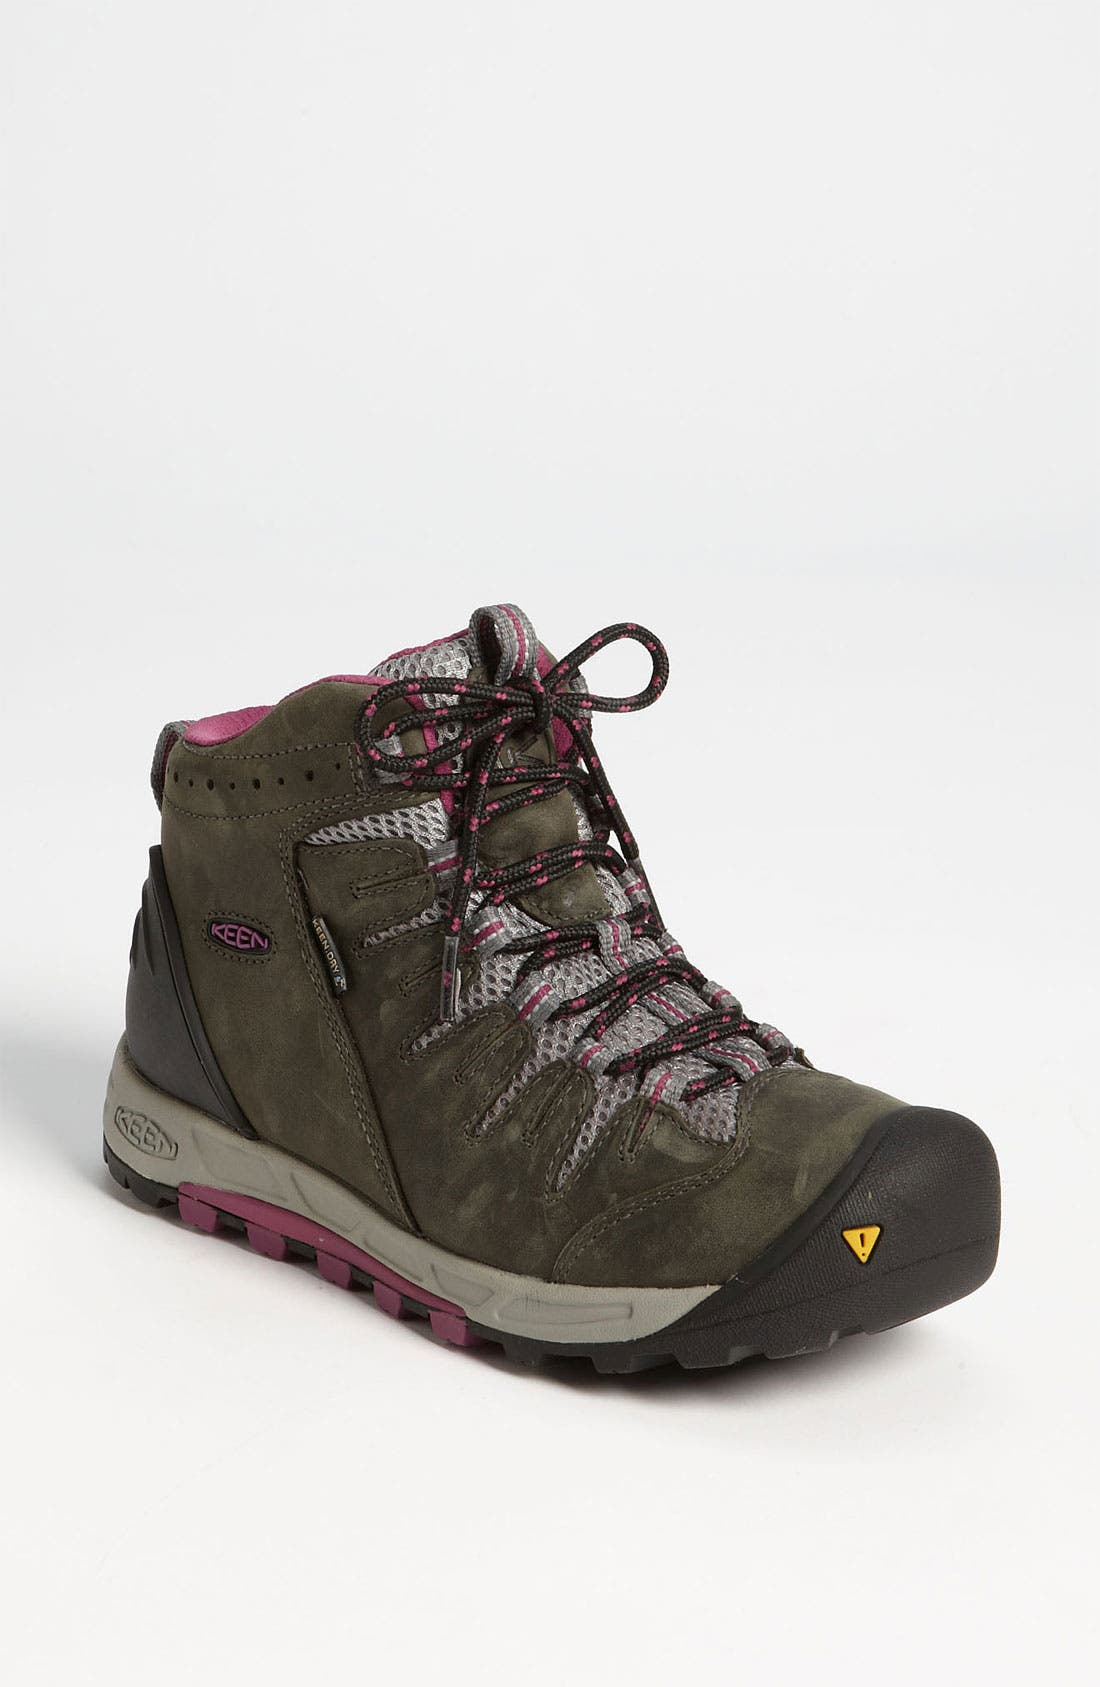 Alternate Image 1 Selected - Keen 'Bryce' Hiking Shoe (Women)